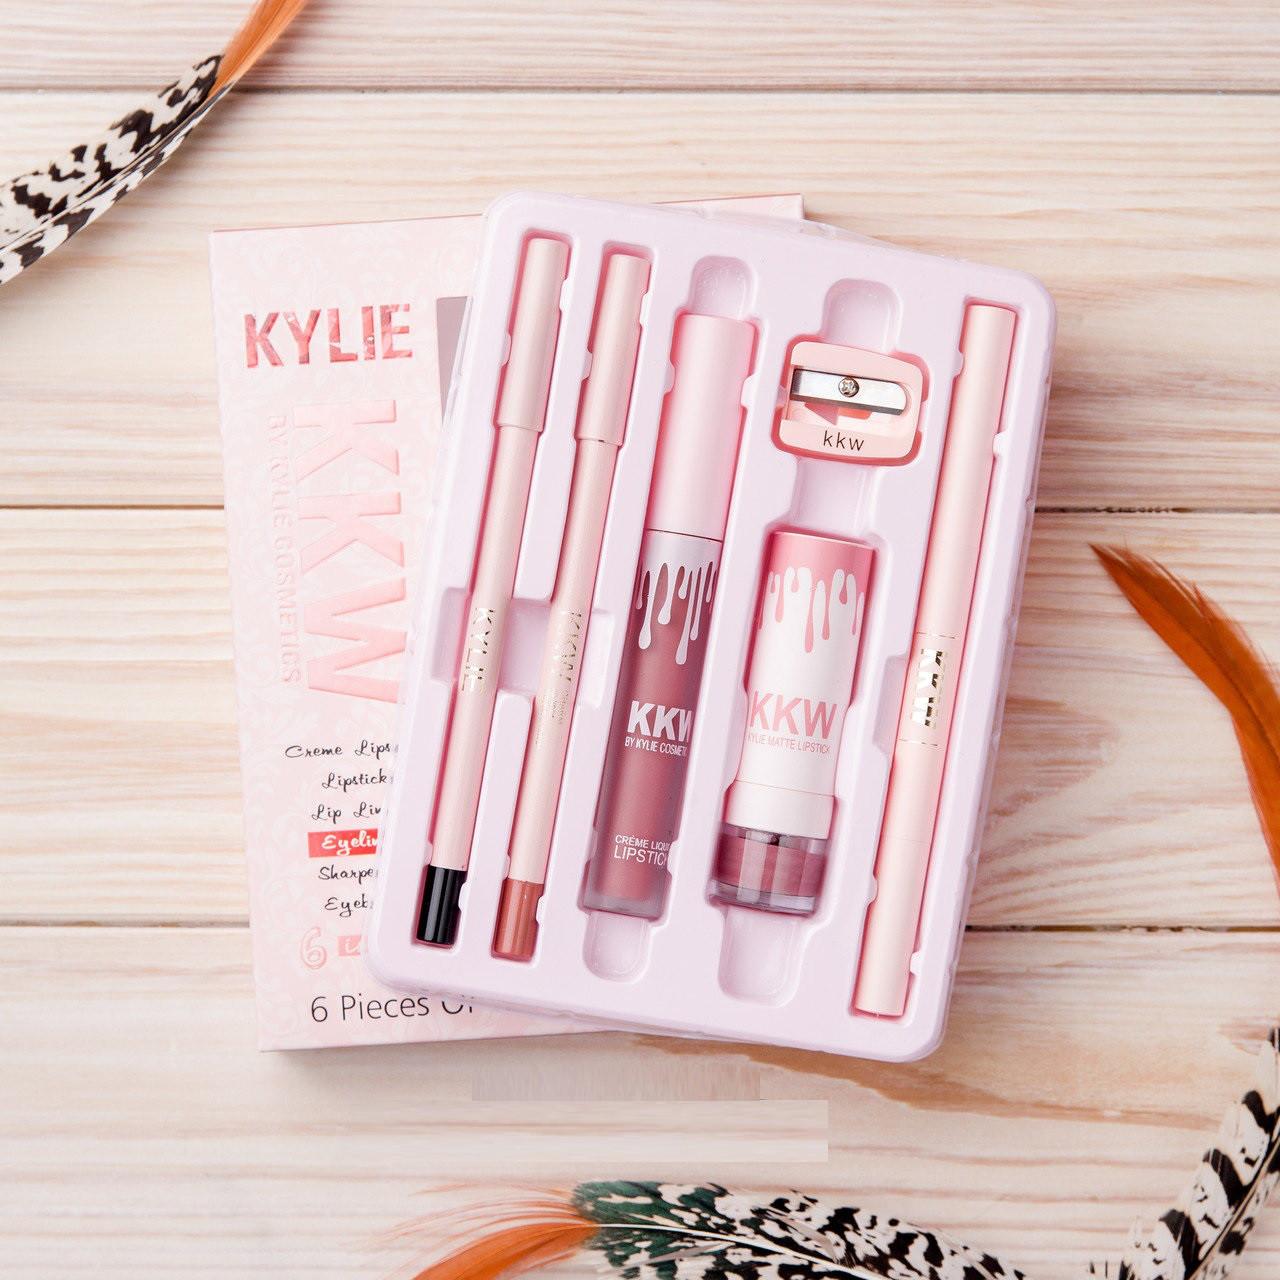 Набор косметики Kylie (Кайли) KKW 6 in1 с точилкой